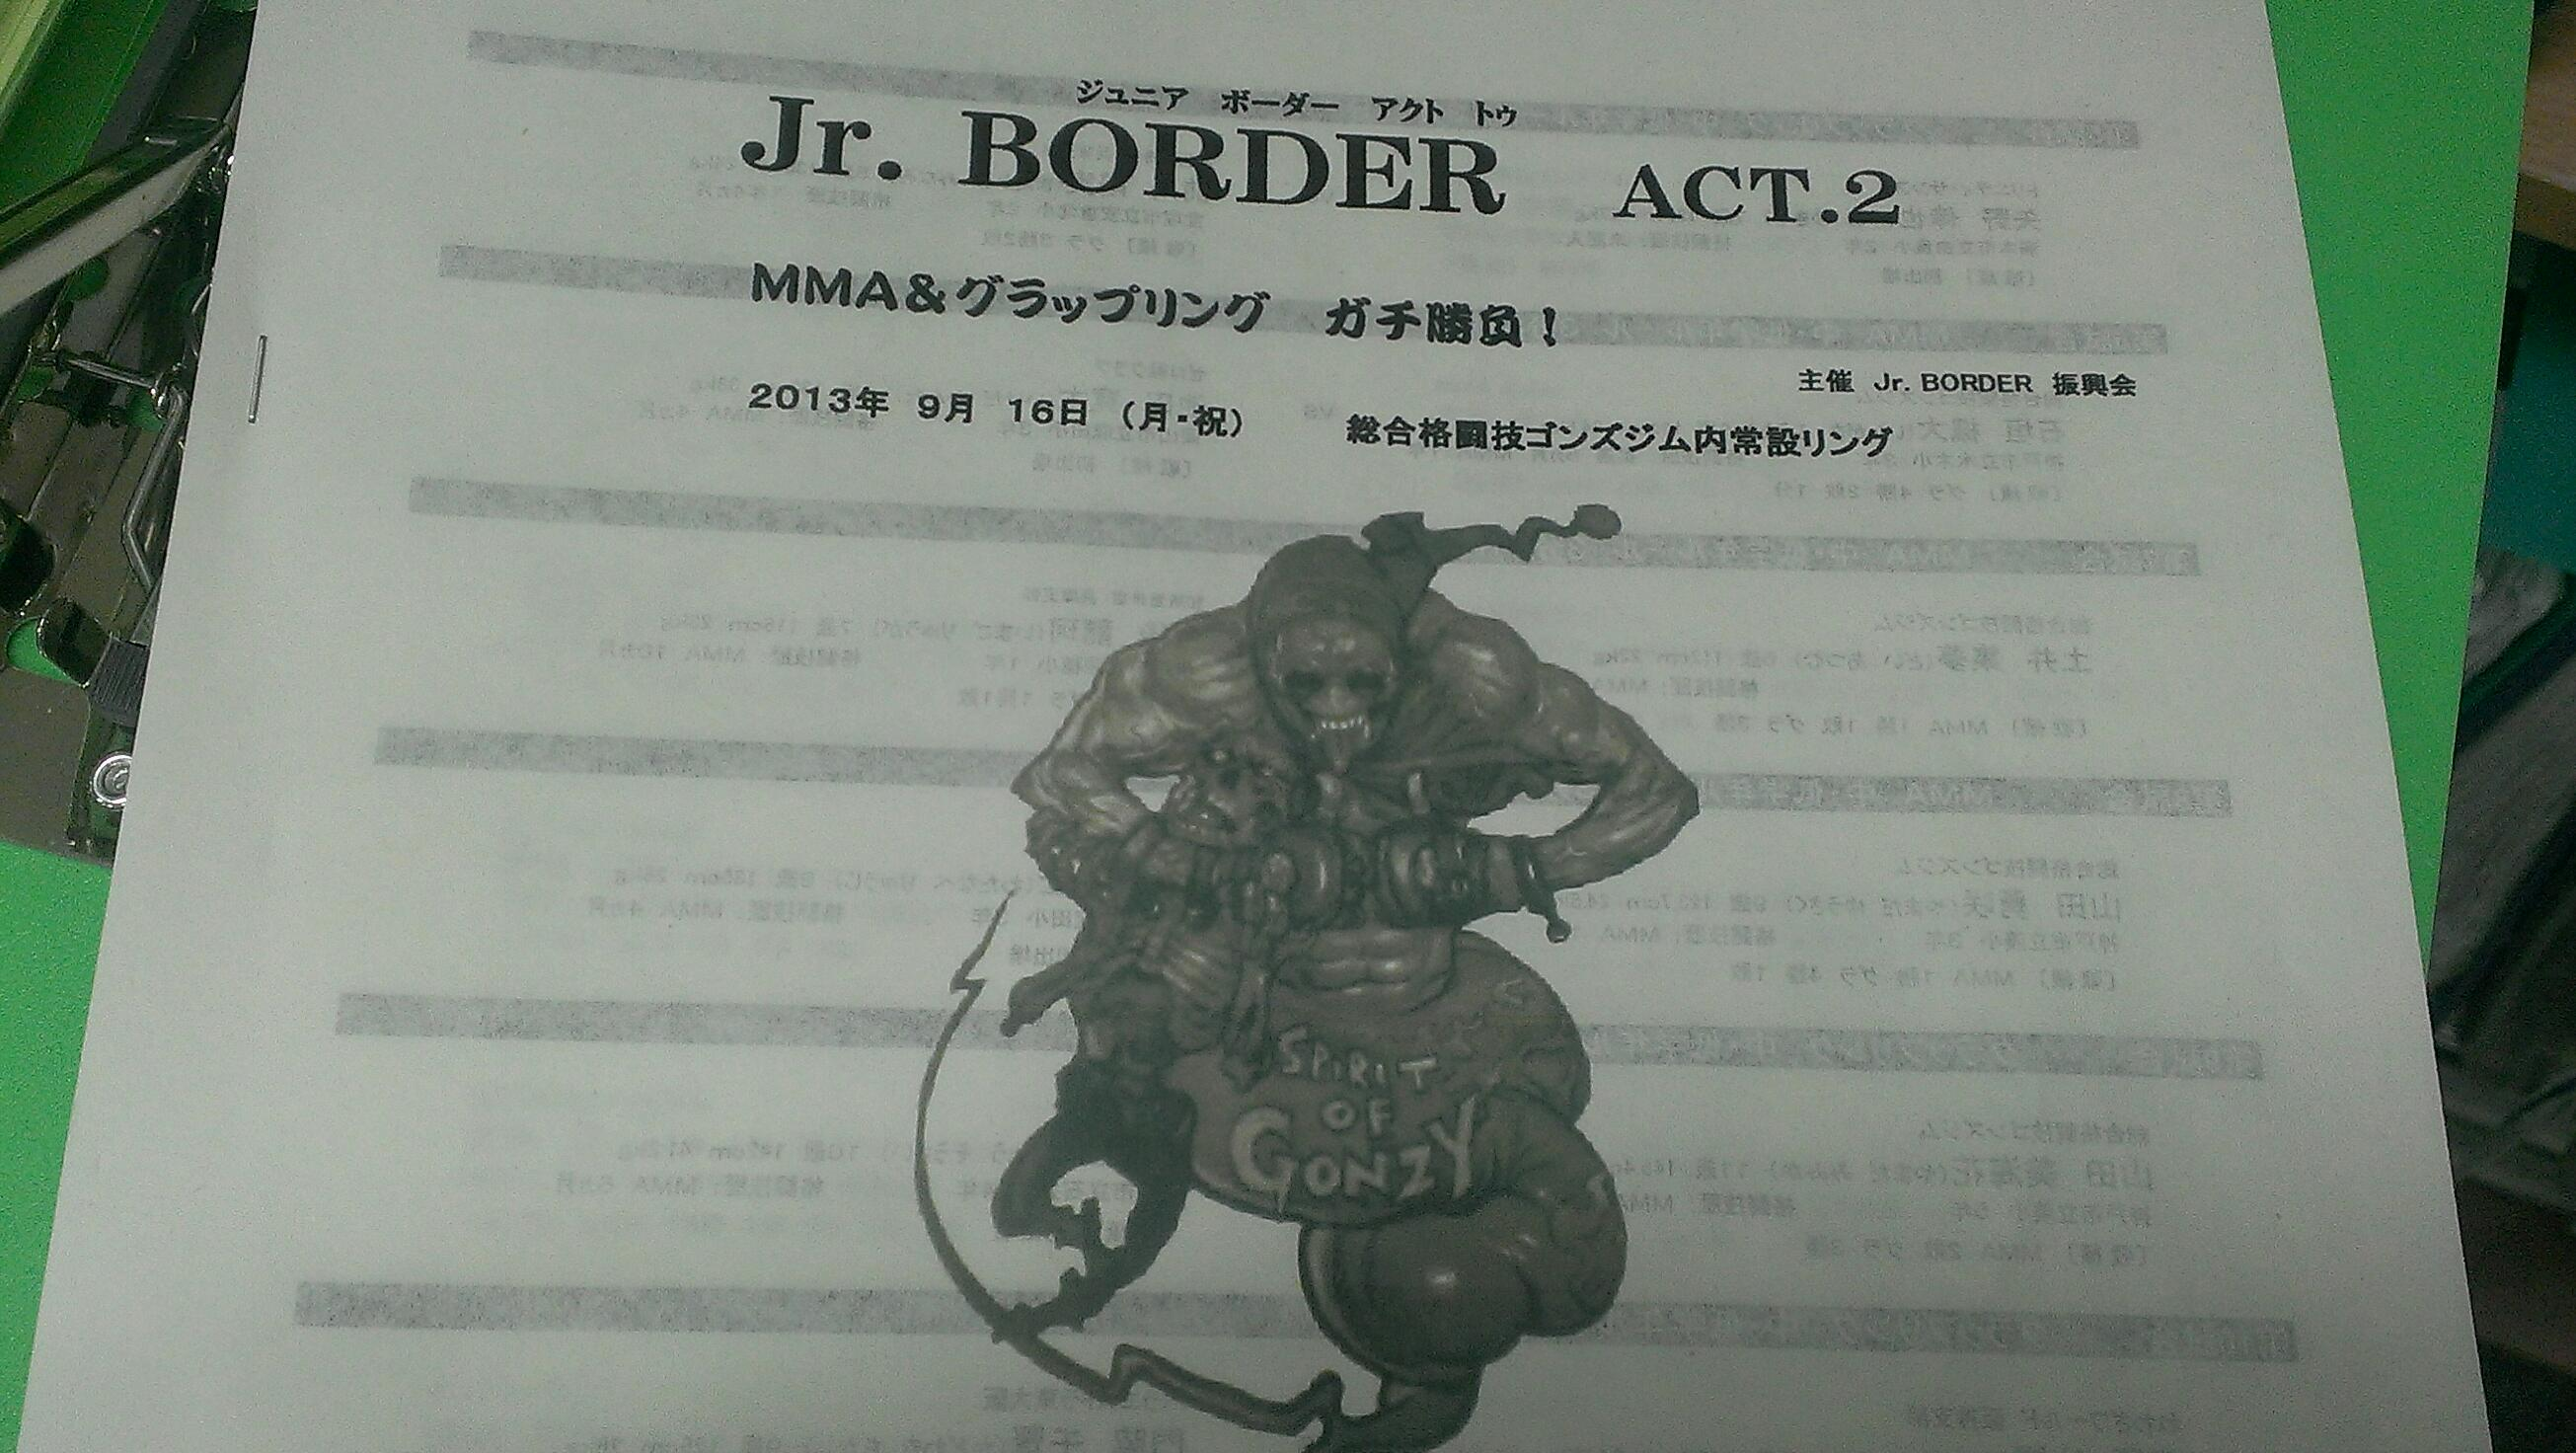 Jr. border 全試合&試合順決定